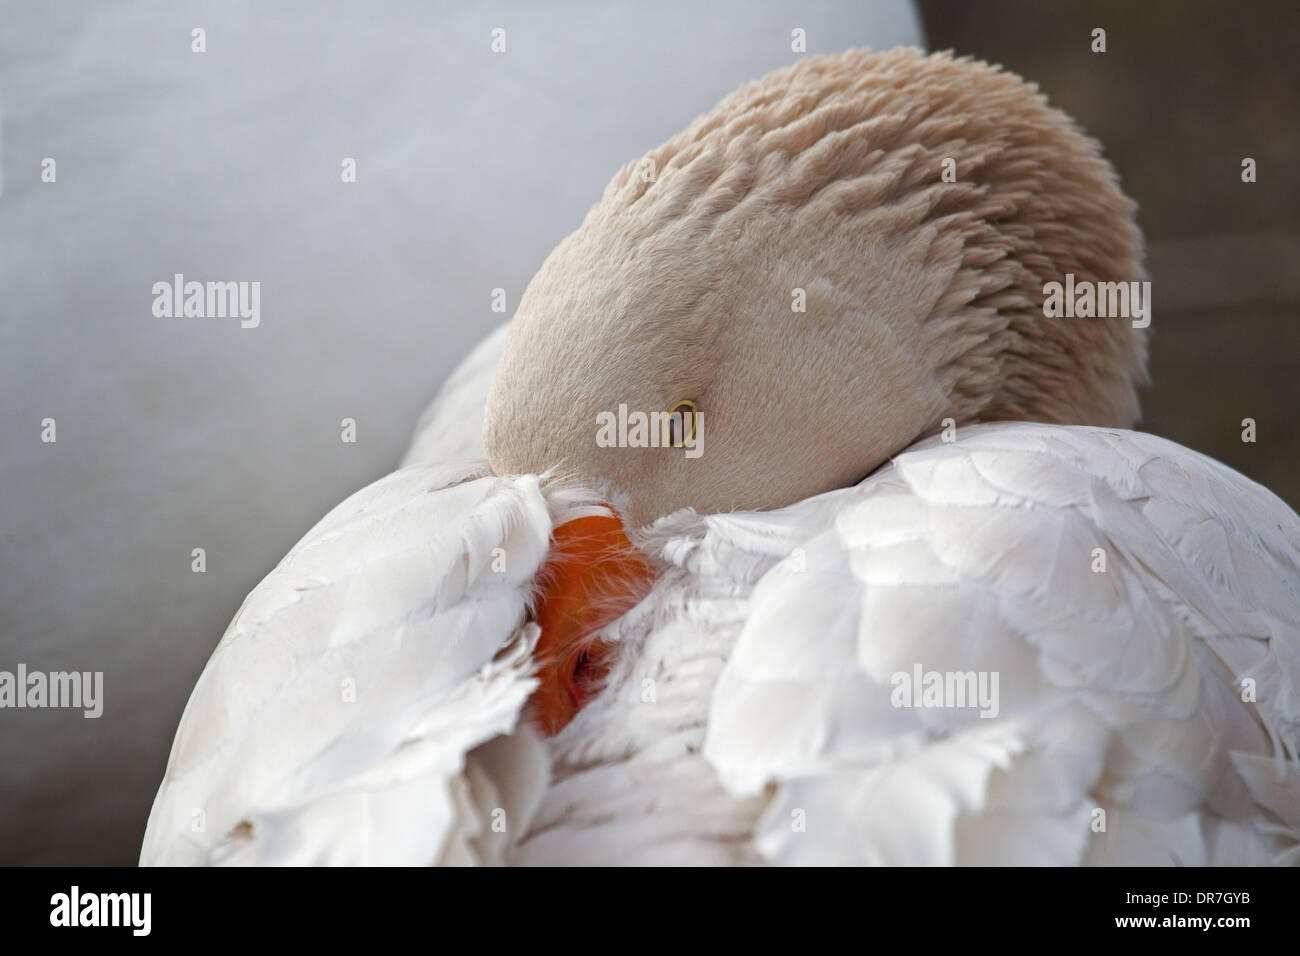 Haken-up orangefarbene Grafschaft ca Somali Dating-Website uk